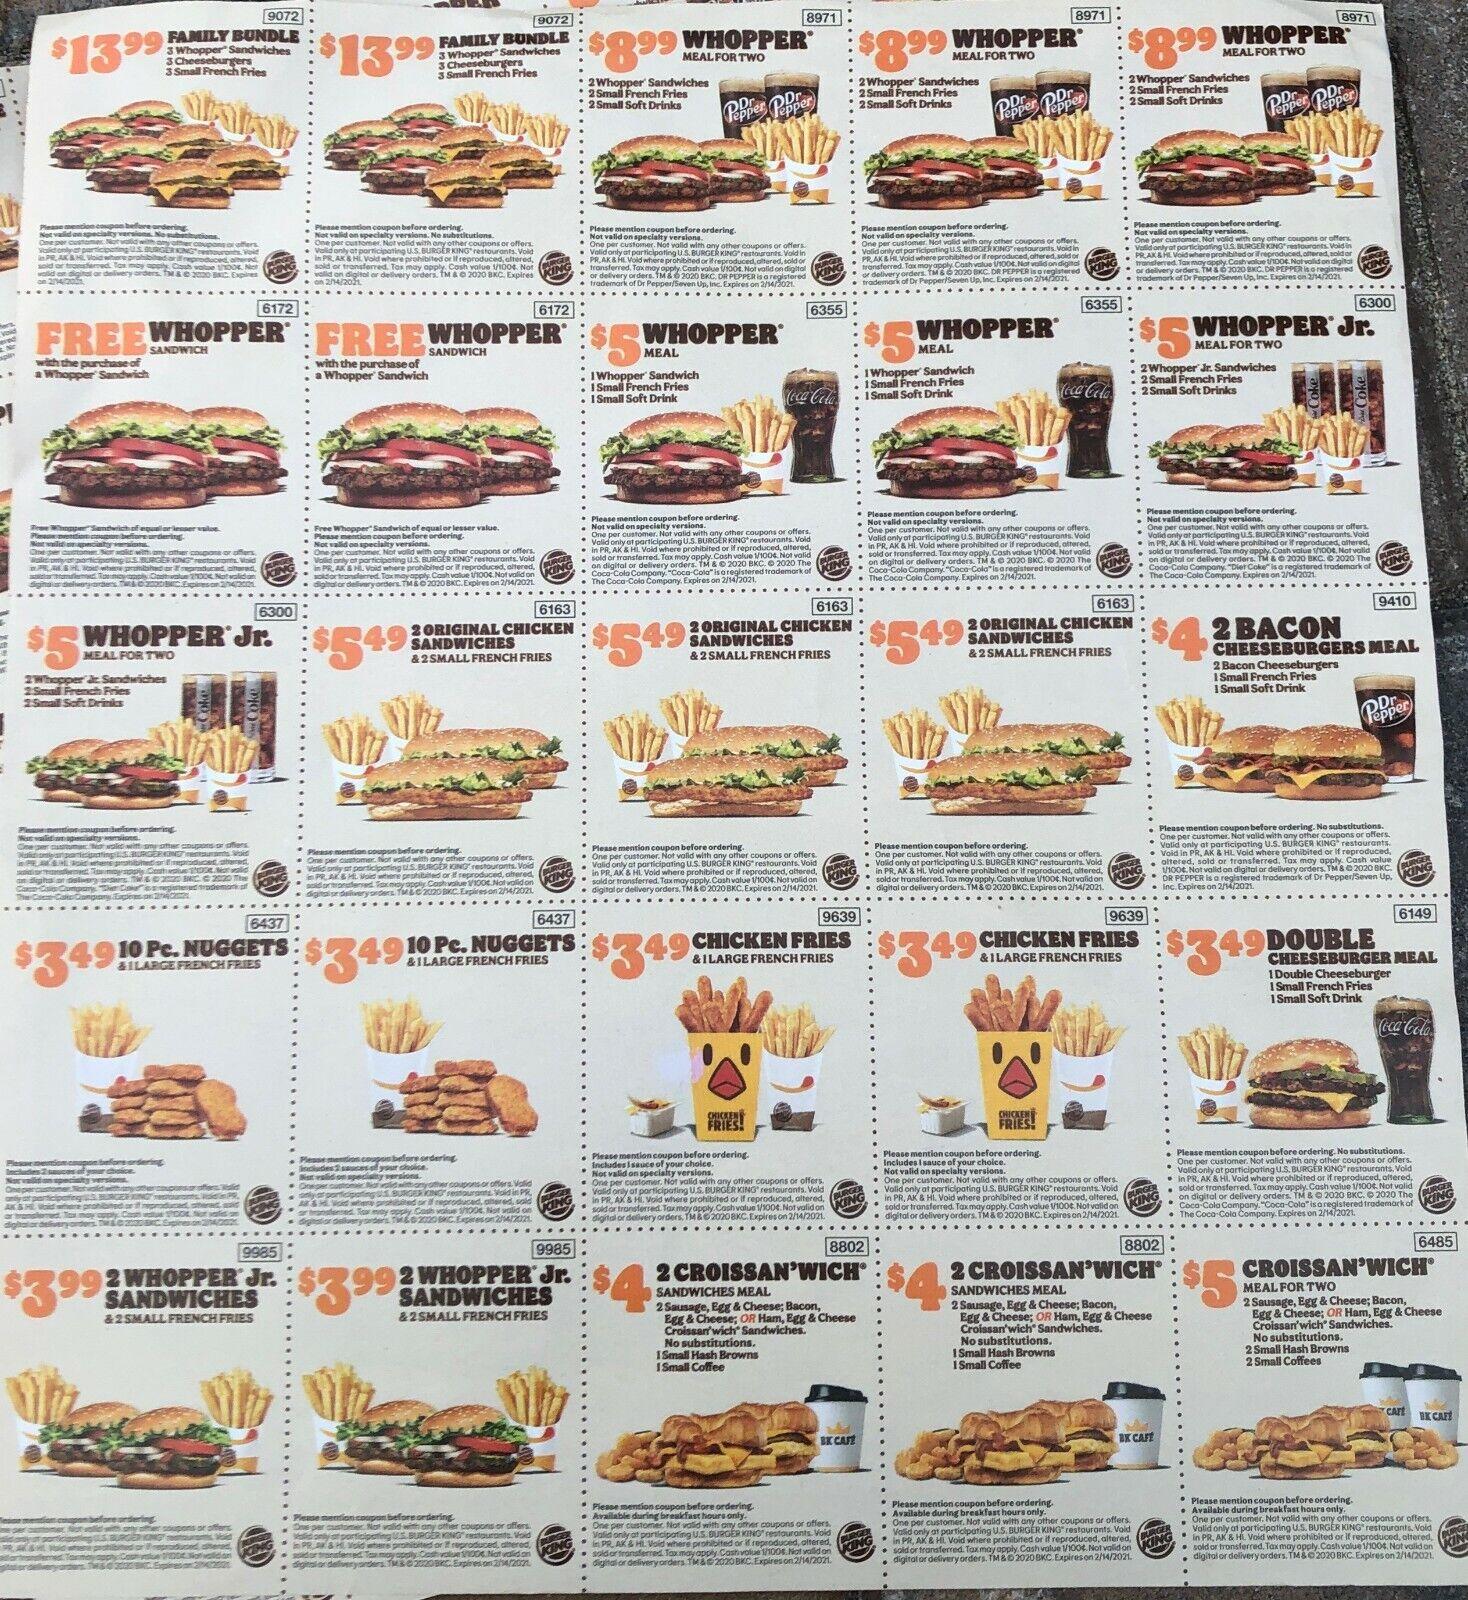 2 Sheets Burger King Coupons Expire 2/14/21 - $2.00